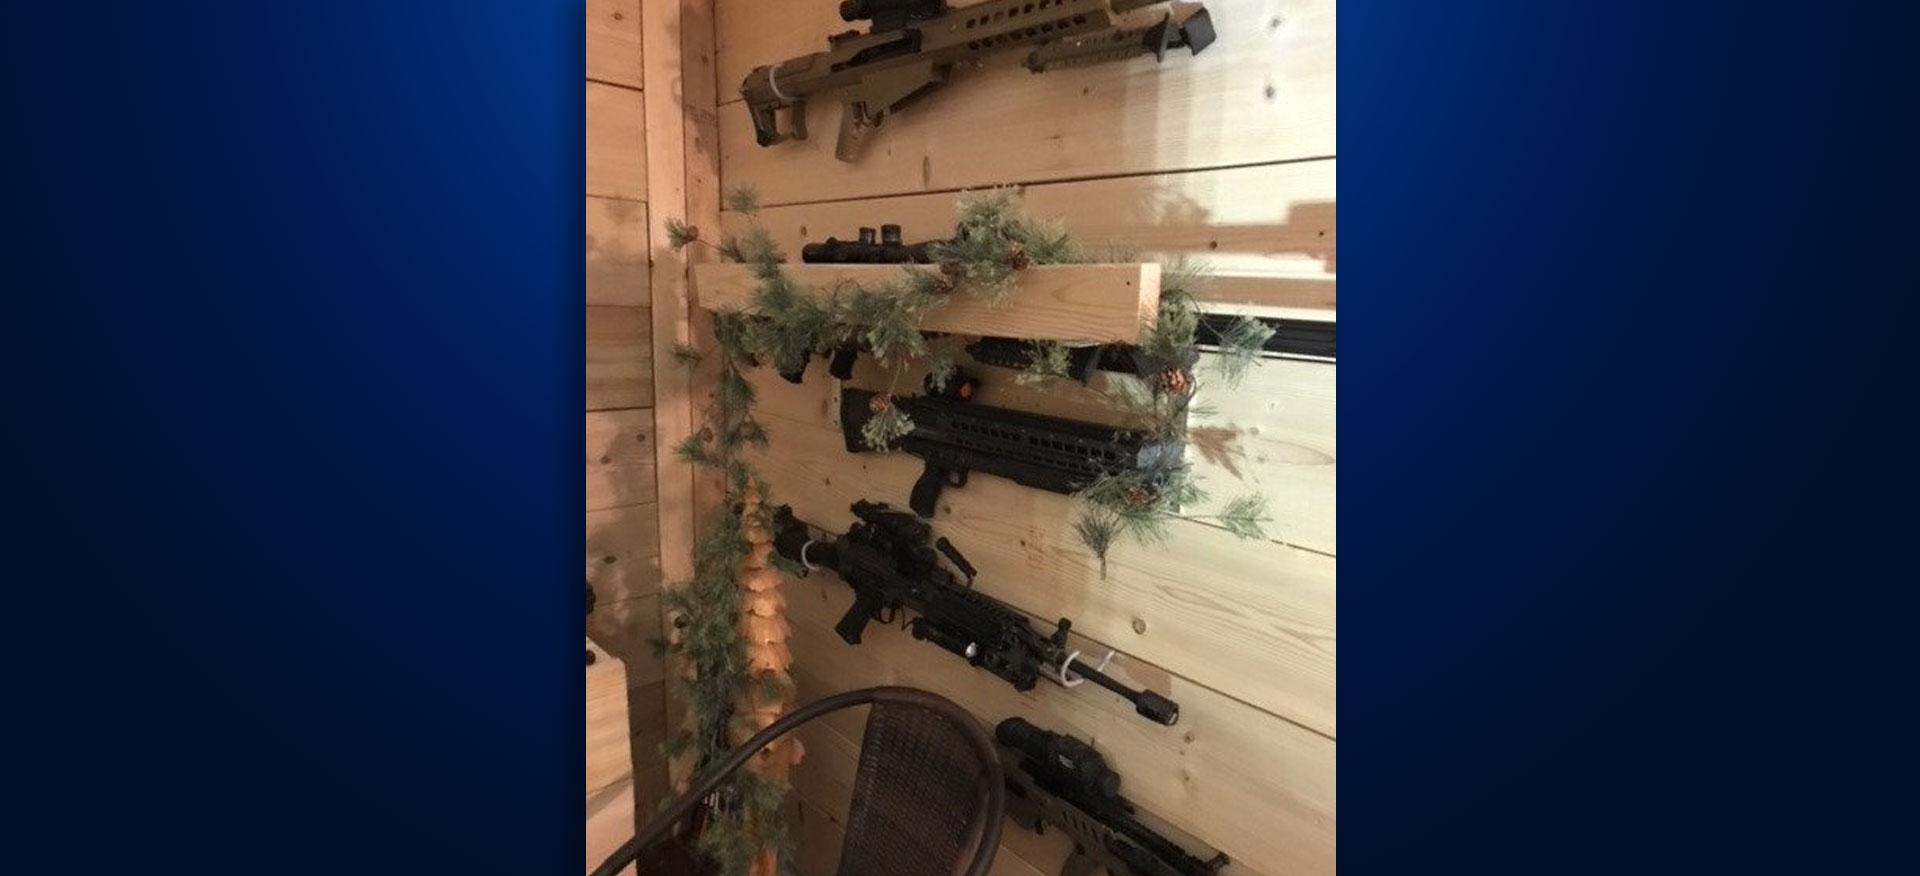 Guns seized Brandon home Artis Kattenburg Iowa shootings